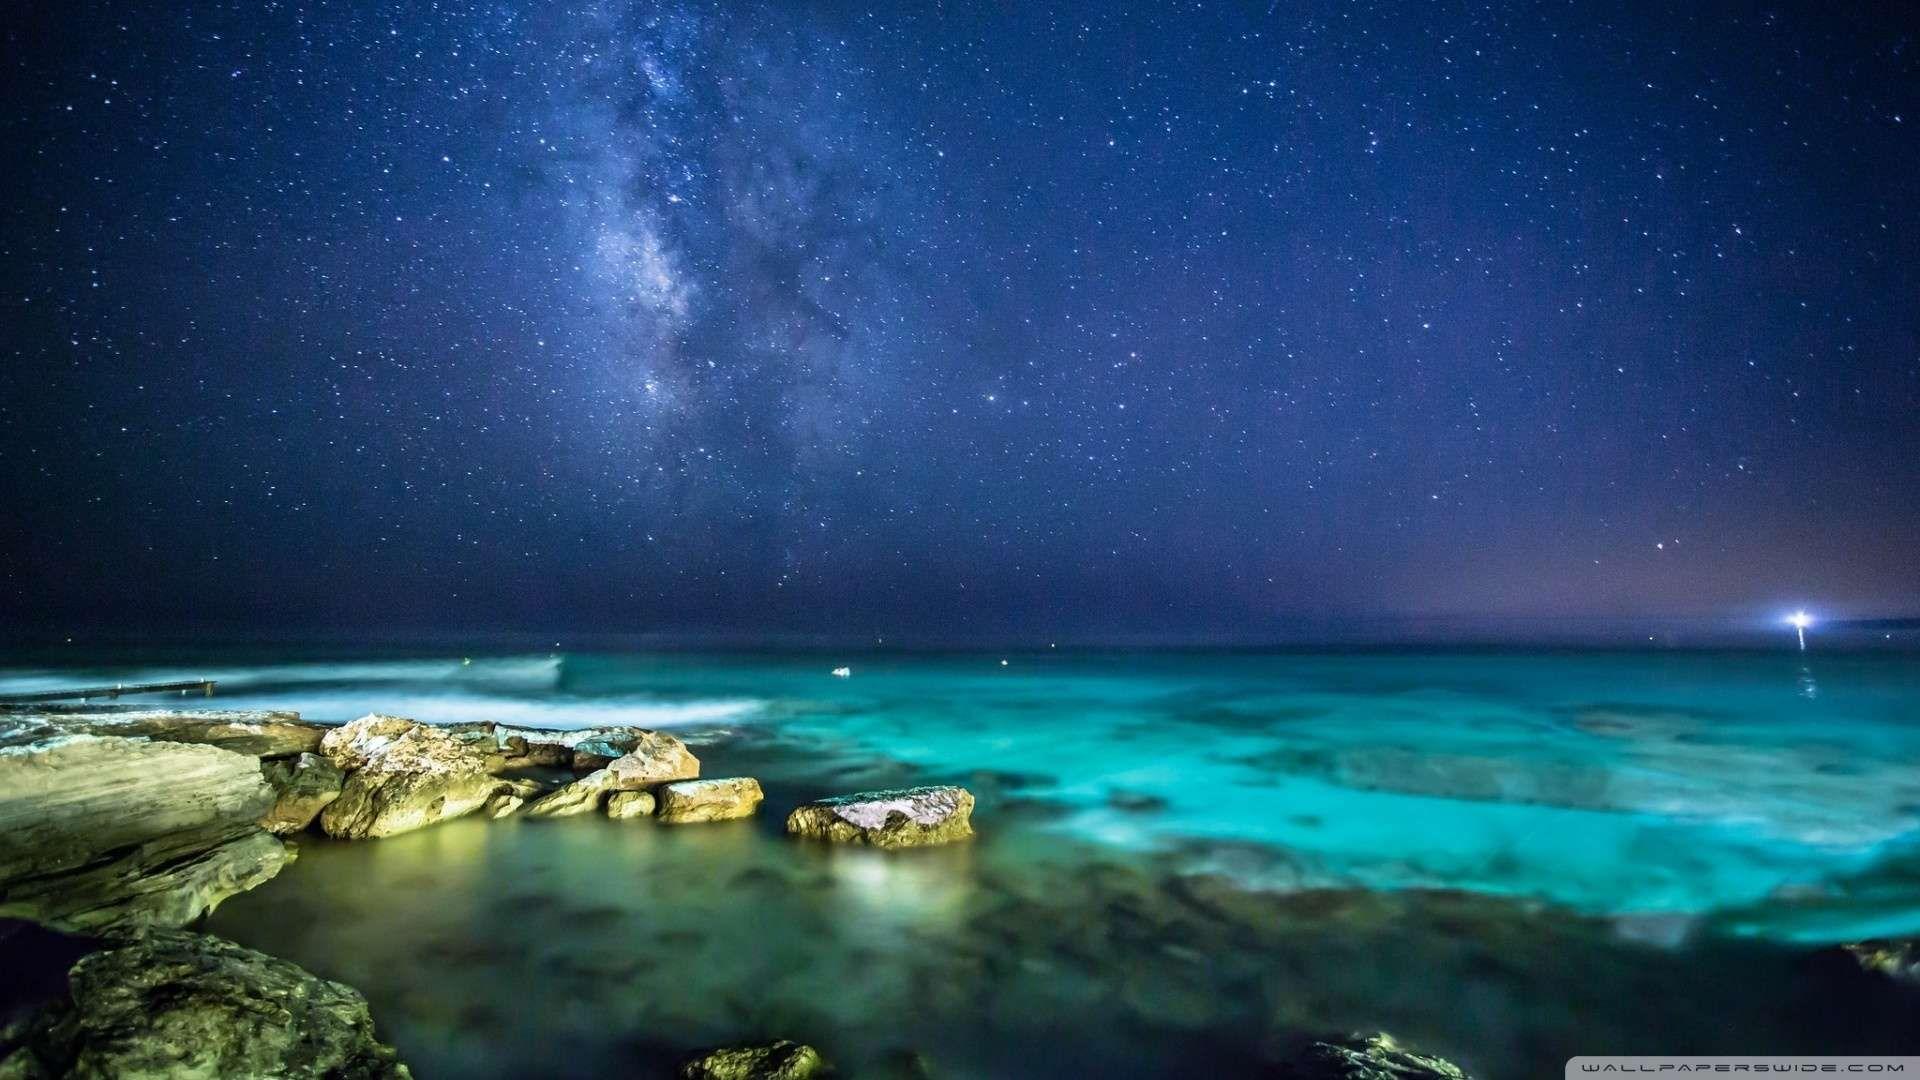 Ocean Night Sky Wallpaper 1080p Hd Ocean At Night Night Sky Wallpaper Night Skies